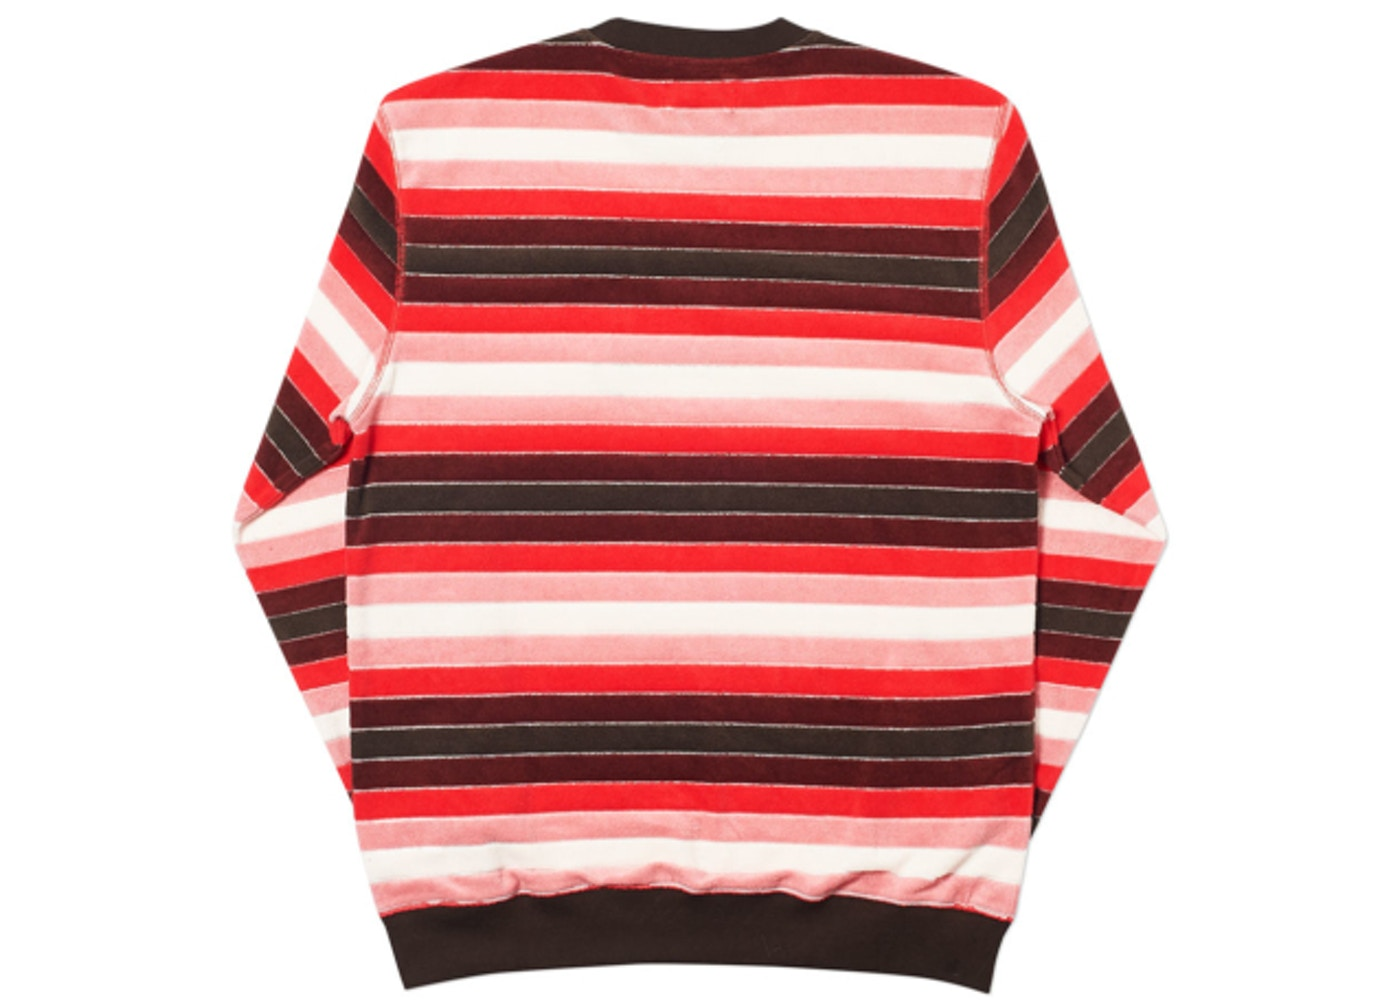 9a429e881a27 Streetwear - Palace Tops Sweatshirts - New Highest Bids